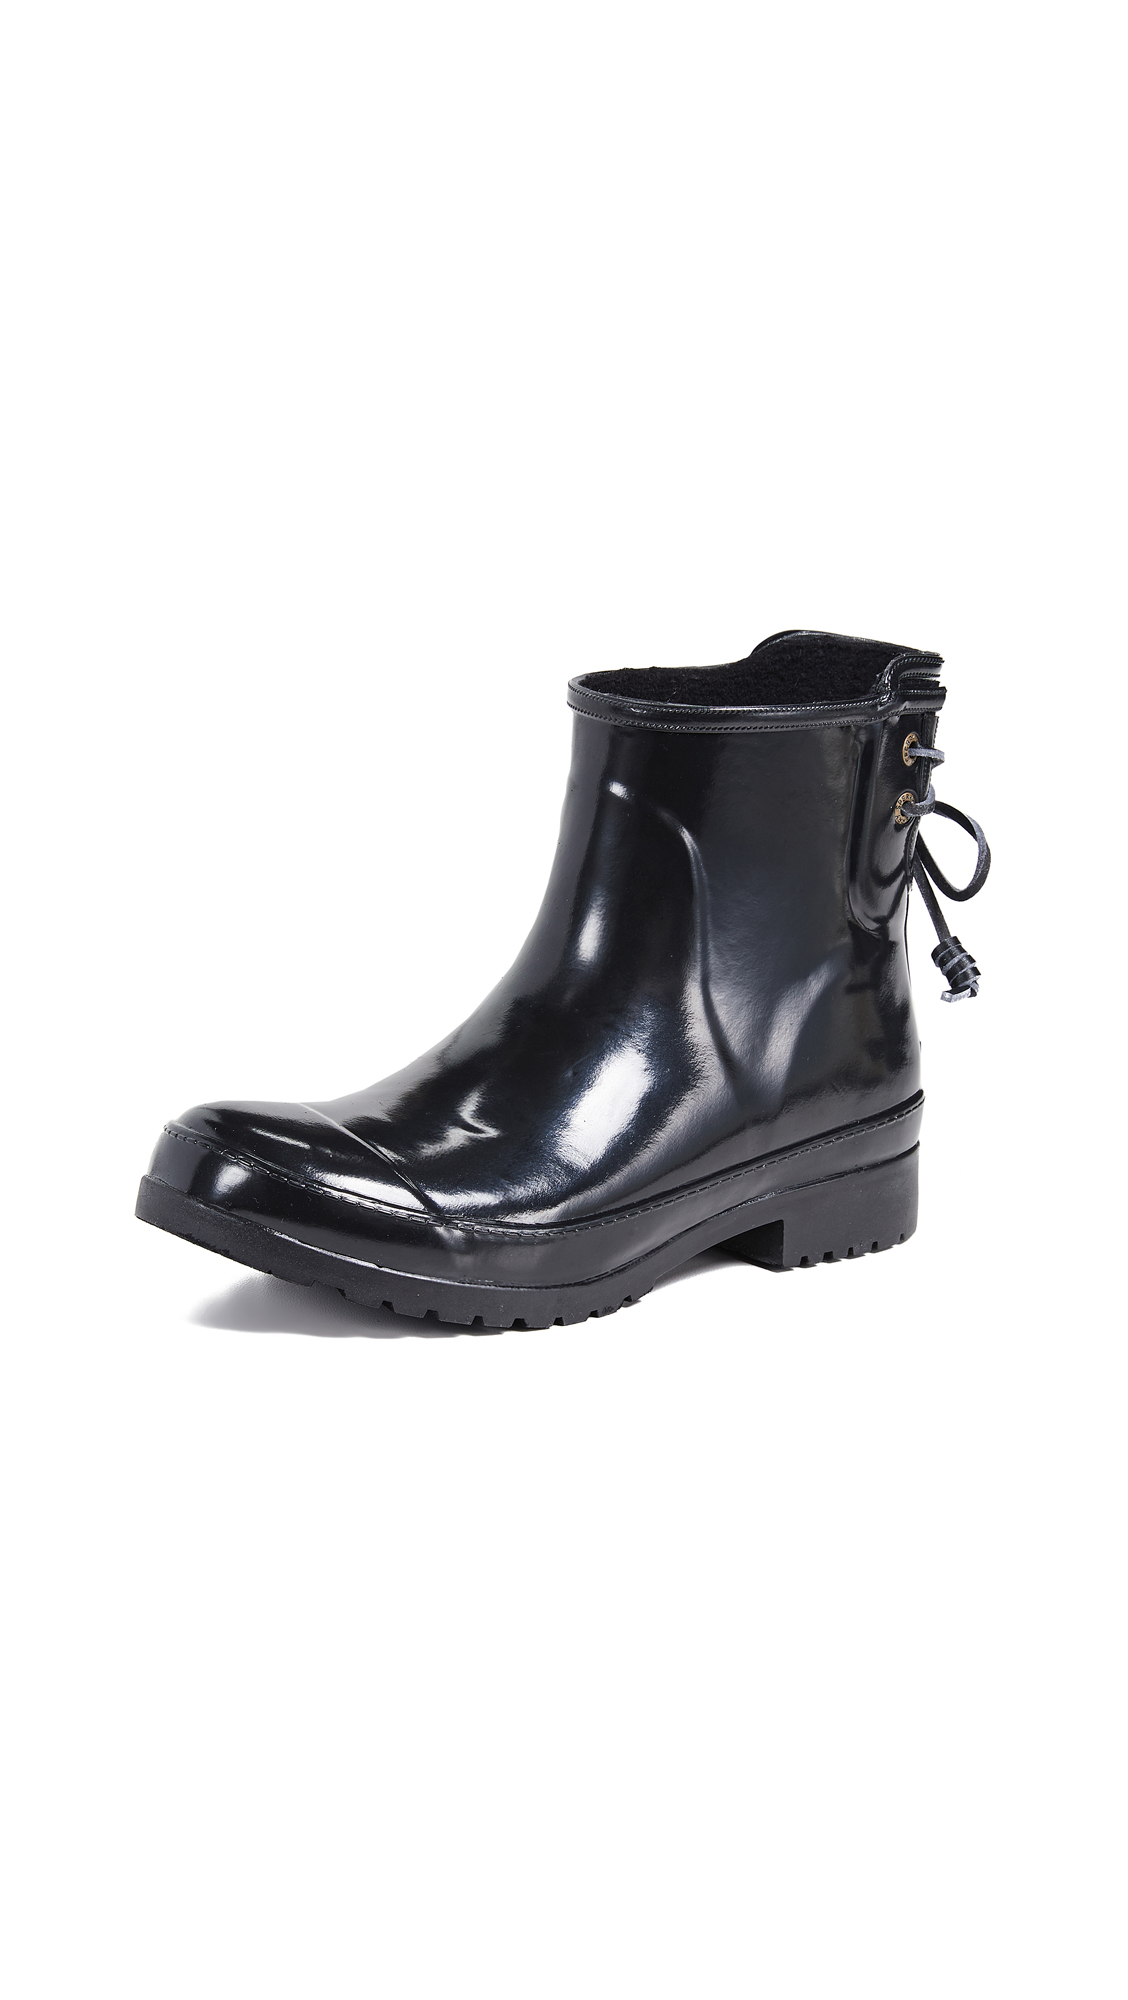 Sperry Walker Turf Boots - Black